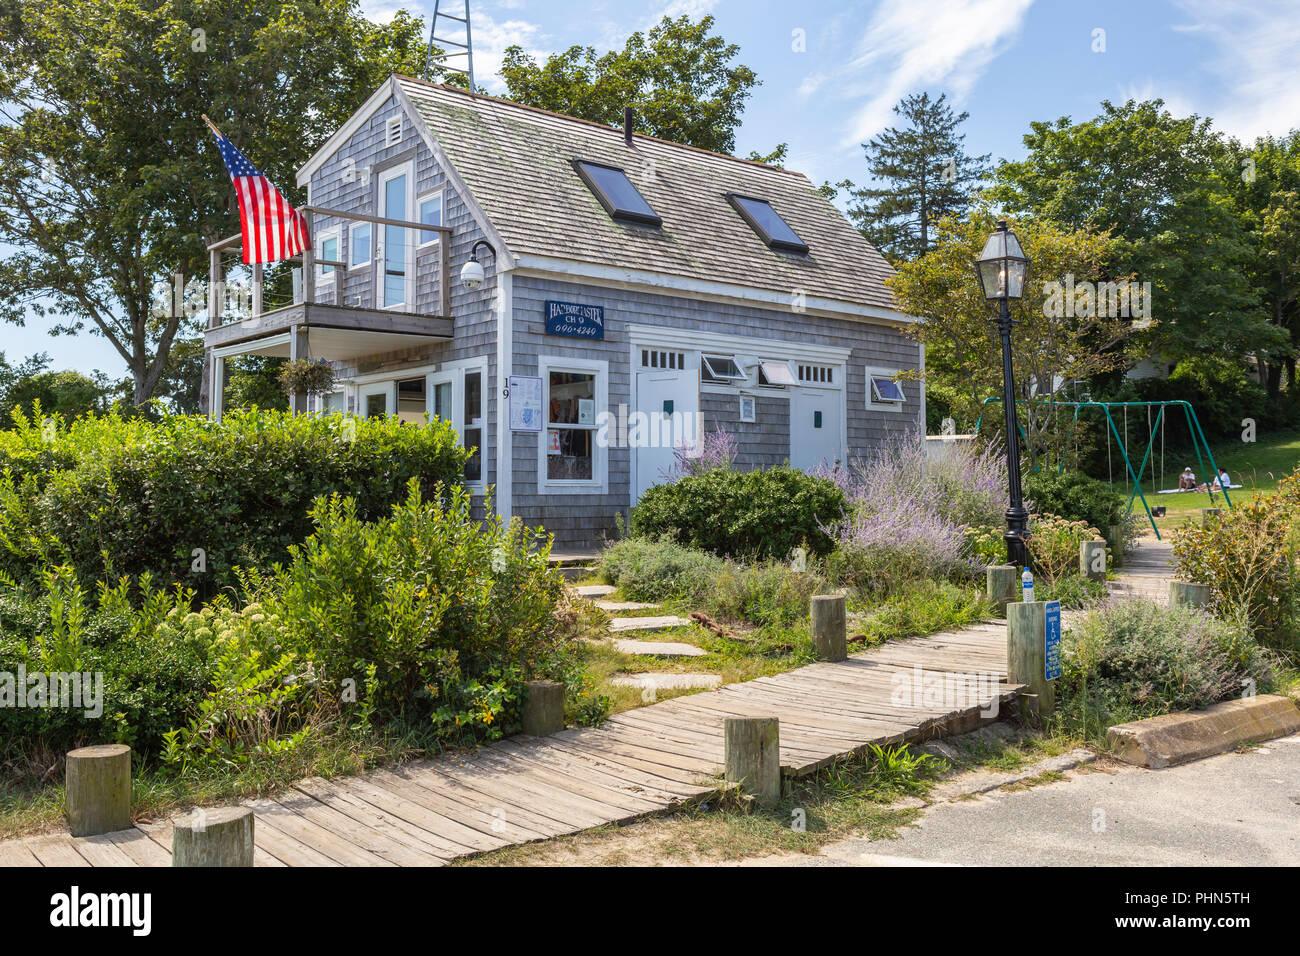 The Harbormaster's office in Owen Park in Tisbury, Massachusetts on Martha's Vineyard. - Stock Image